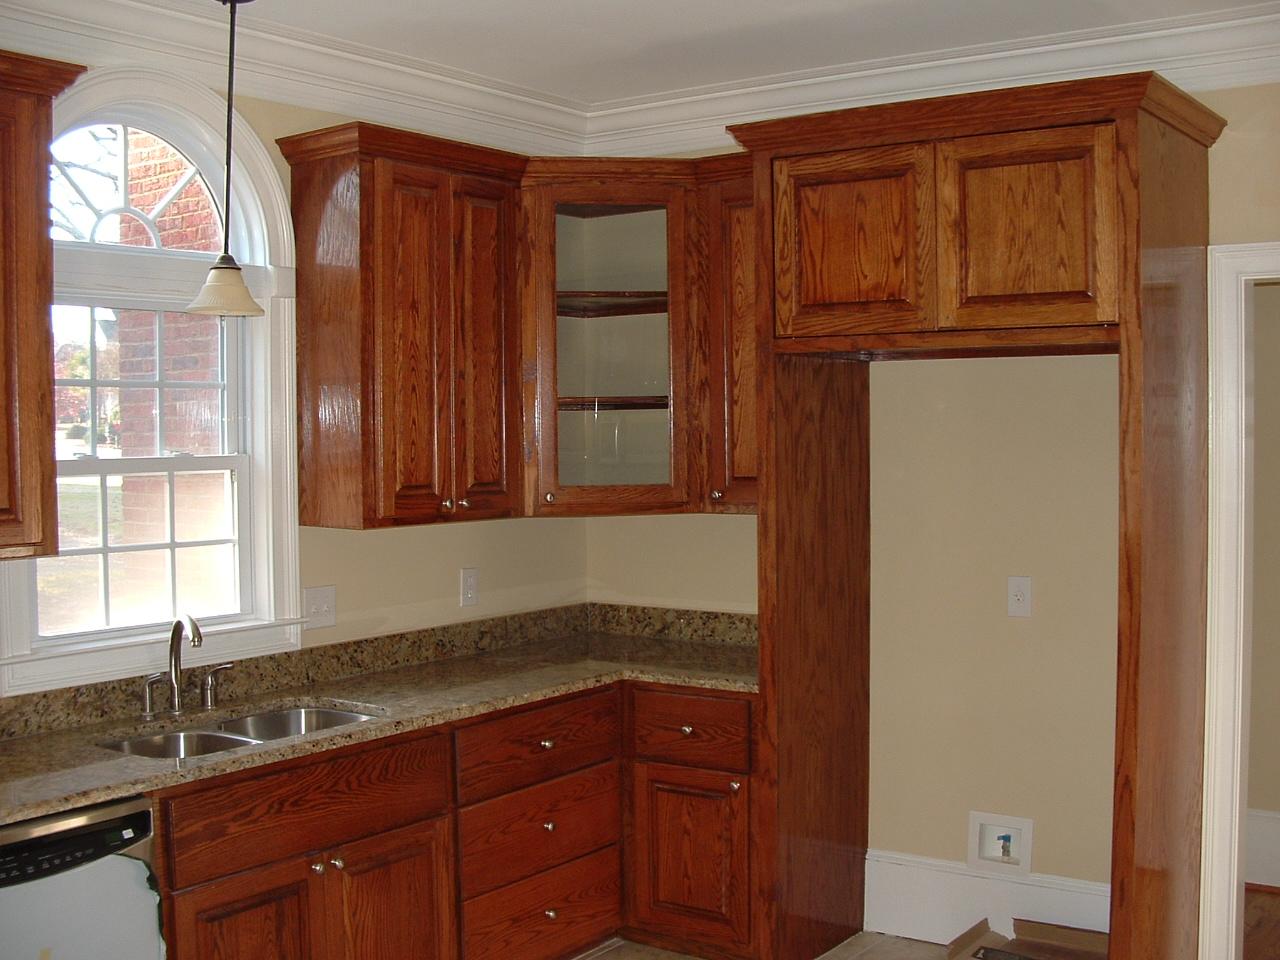 Kitchen pantry cupboard photo - 1